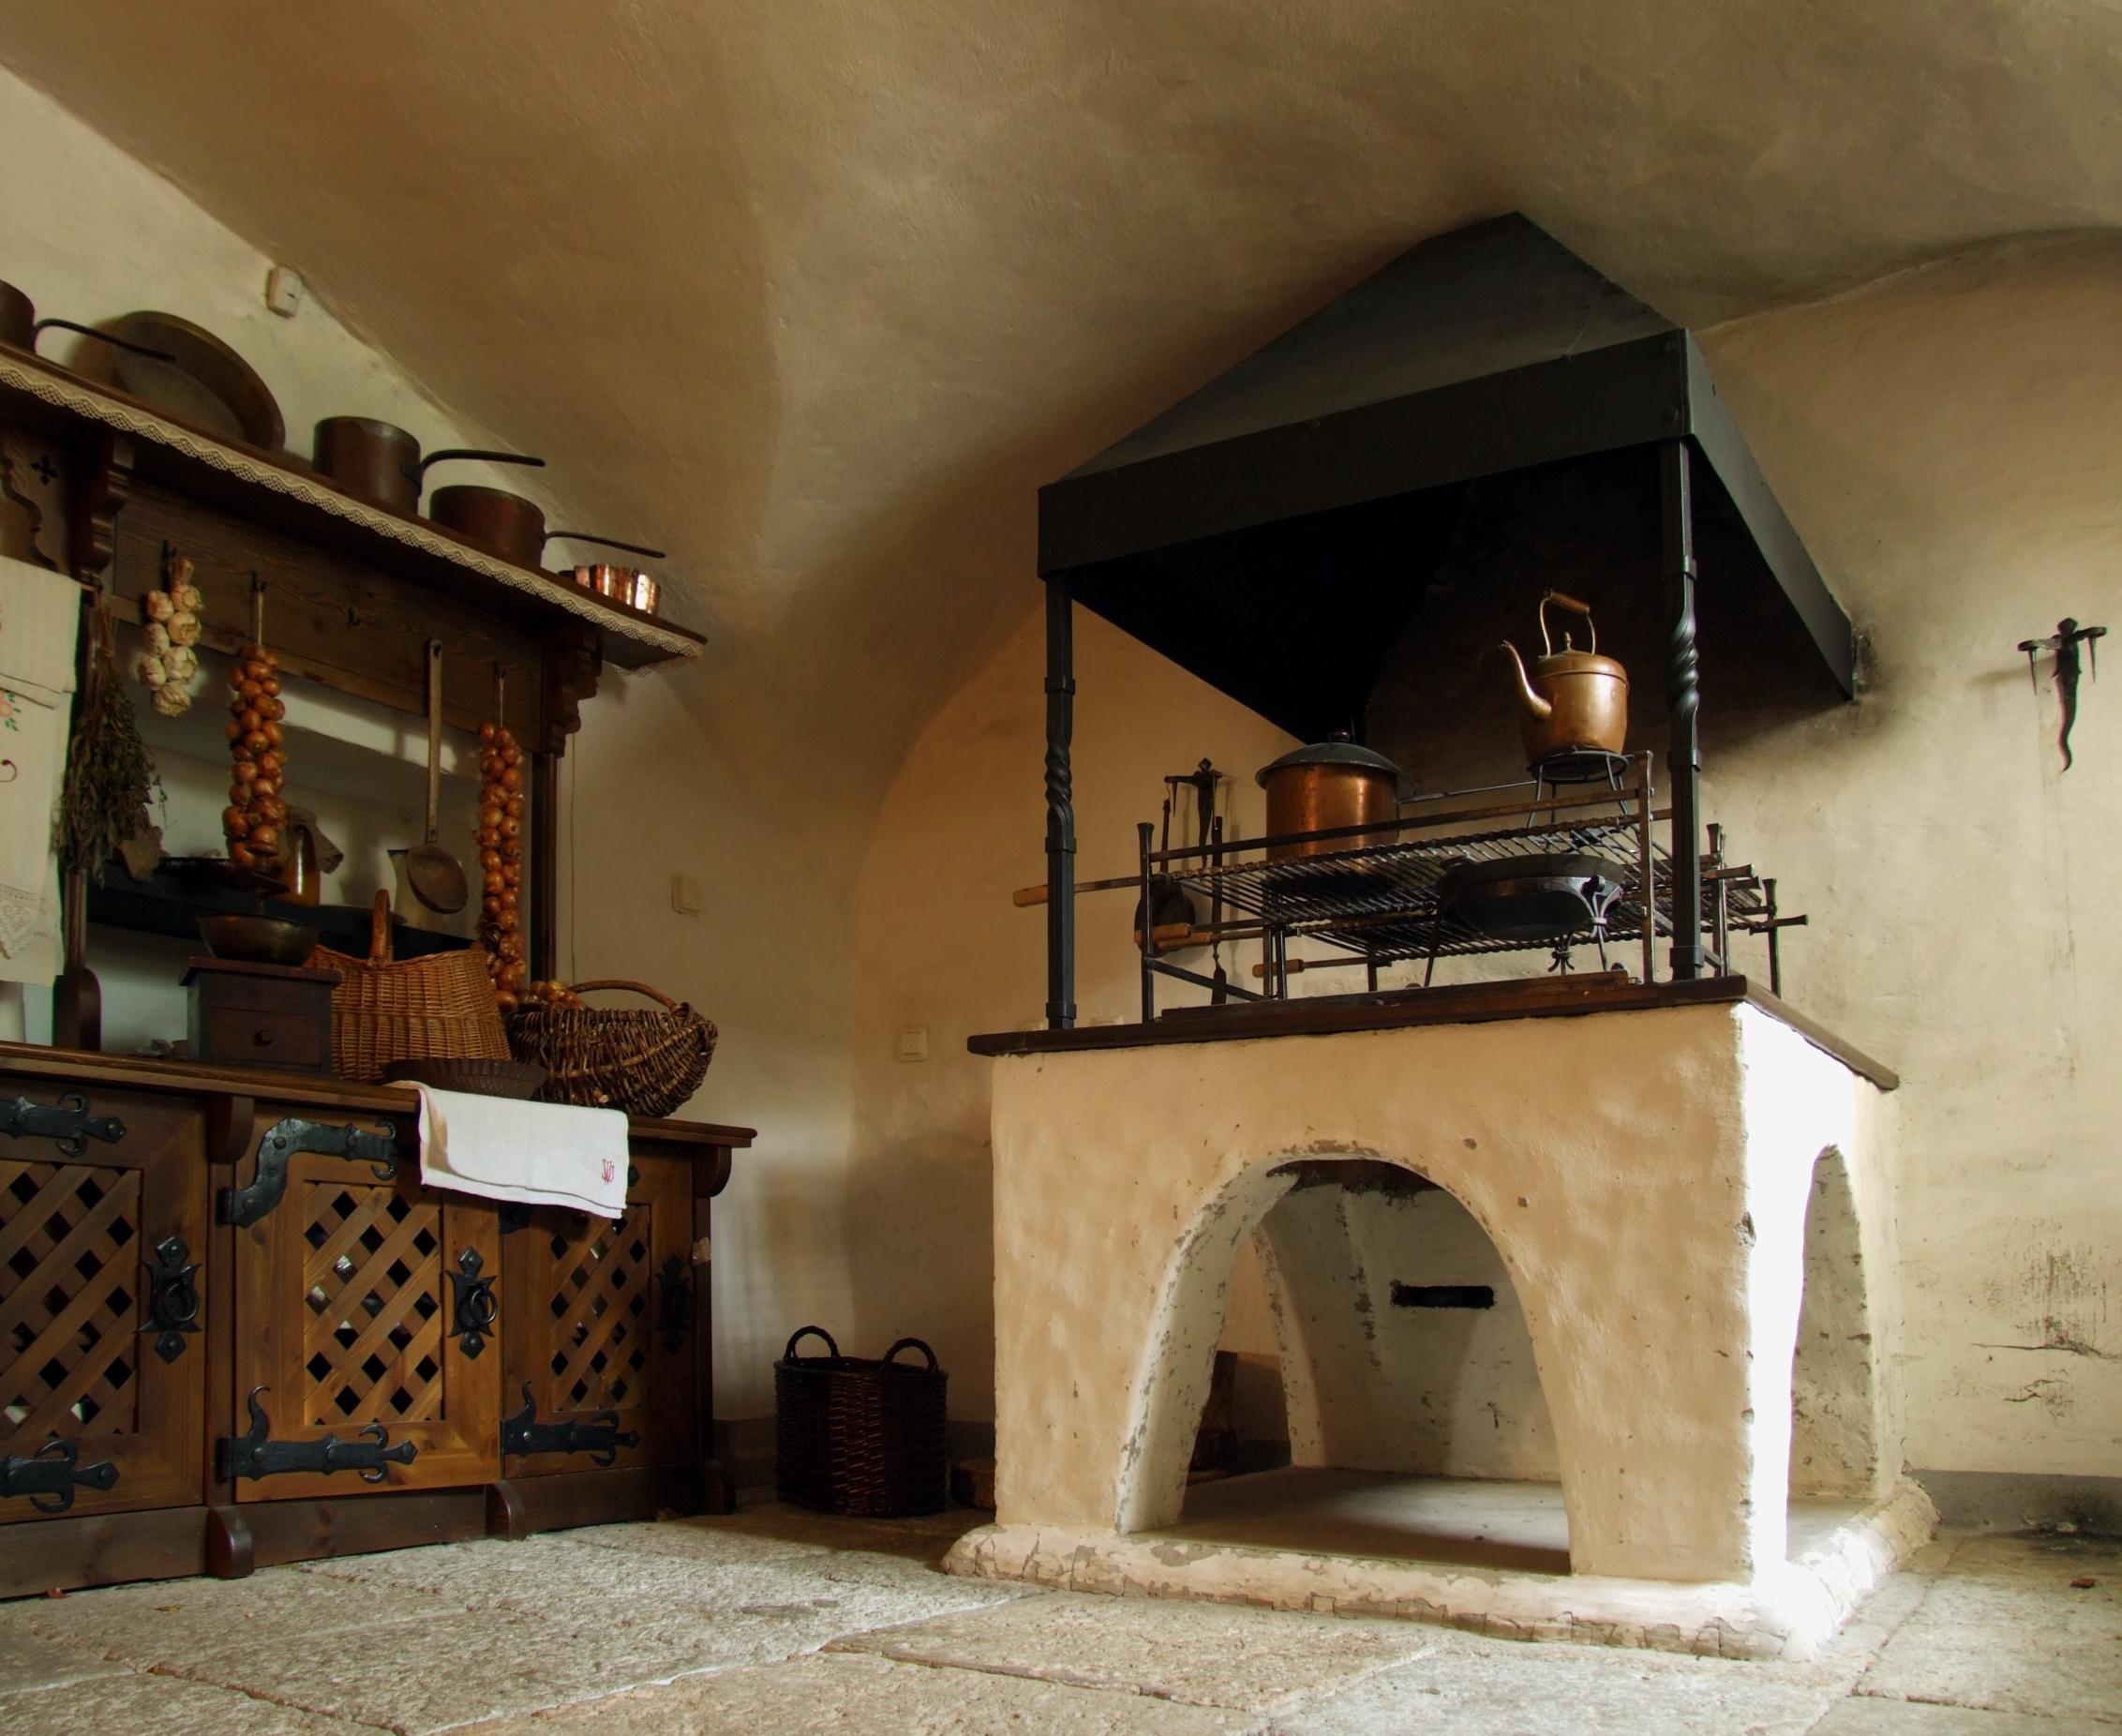 file:palmse manor house - kitchen - wikimedia commons